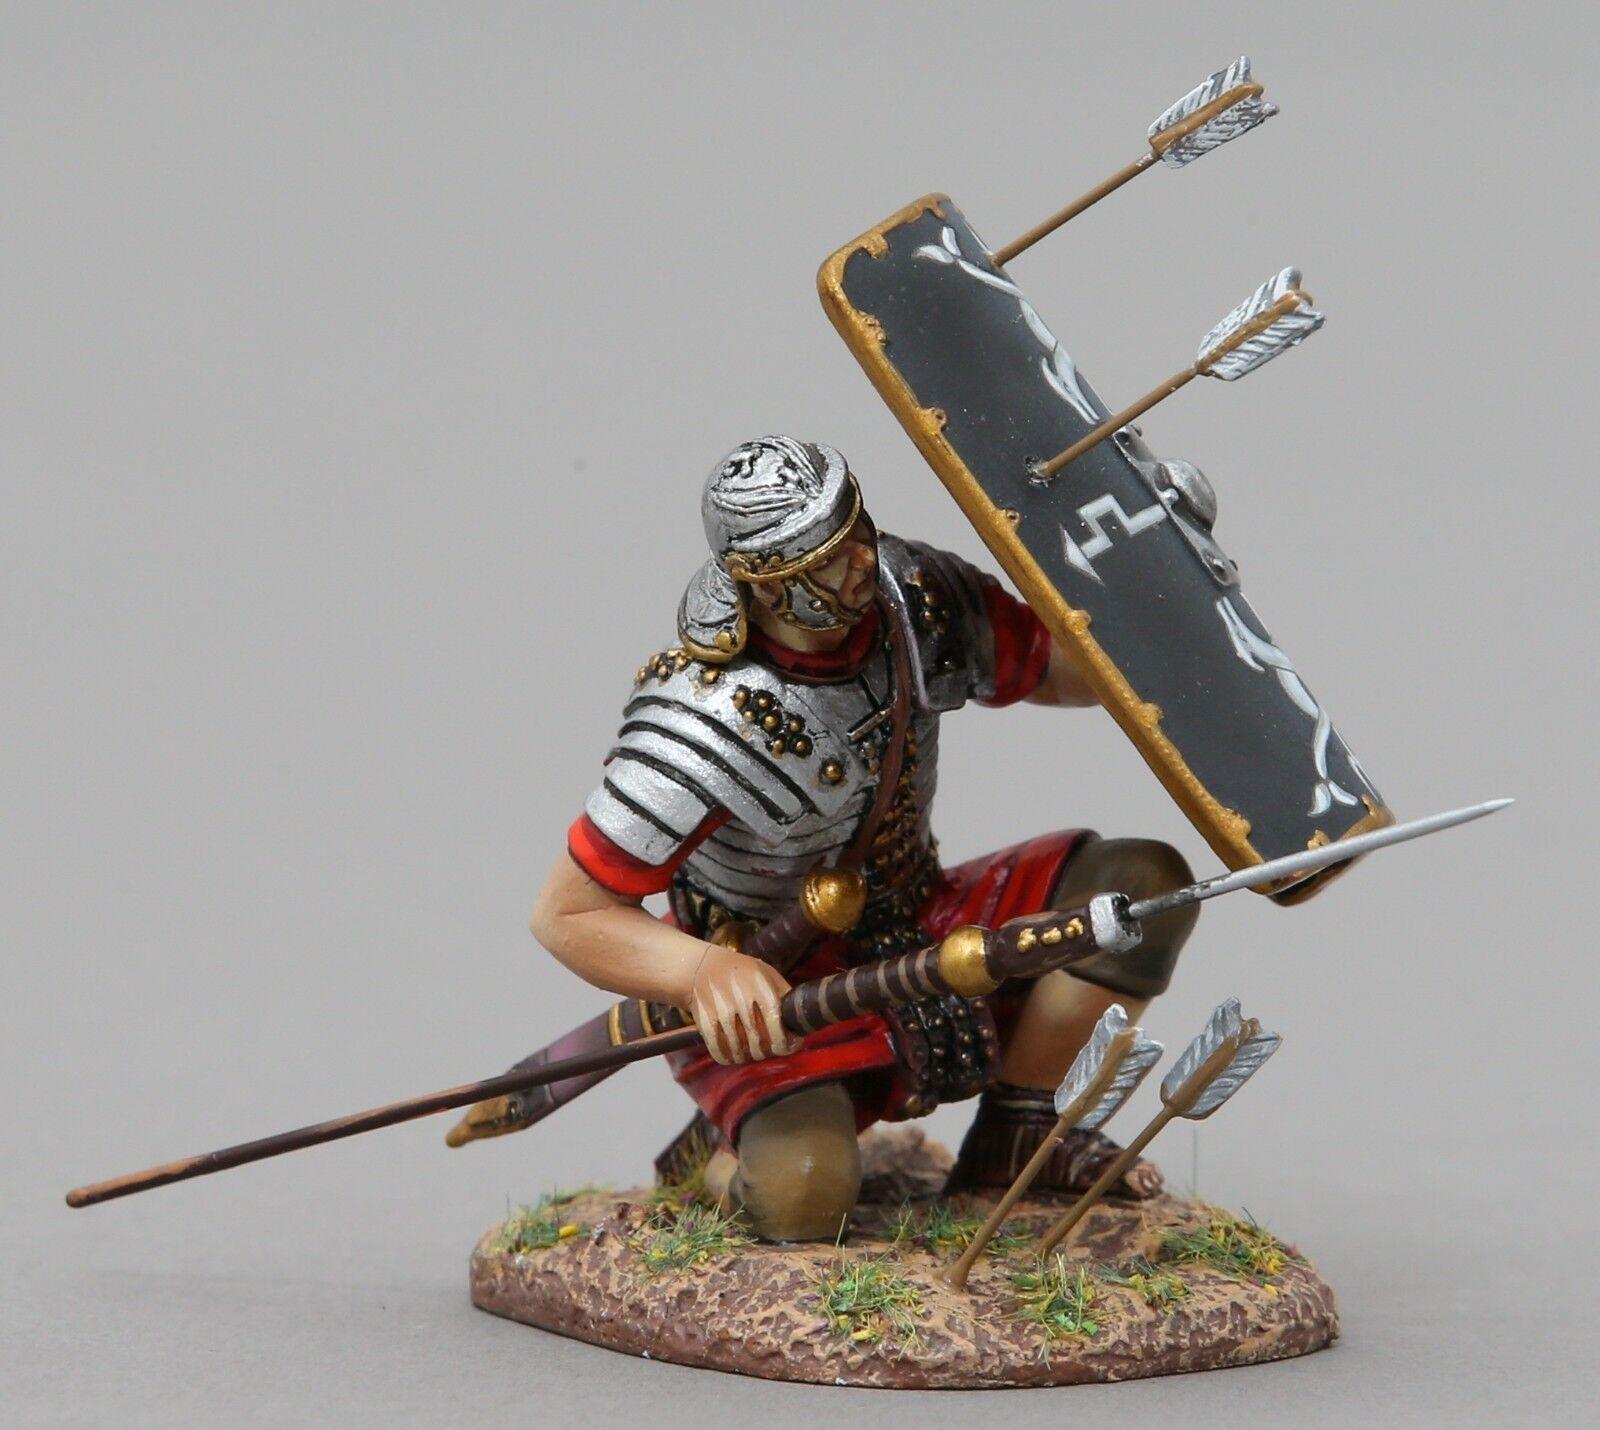 Thomas Gunn Roman Empire ROM105B 30th Legionär Kniend mit Pilum Schwarz MIB